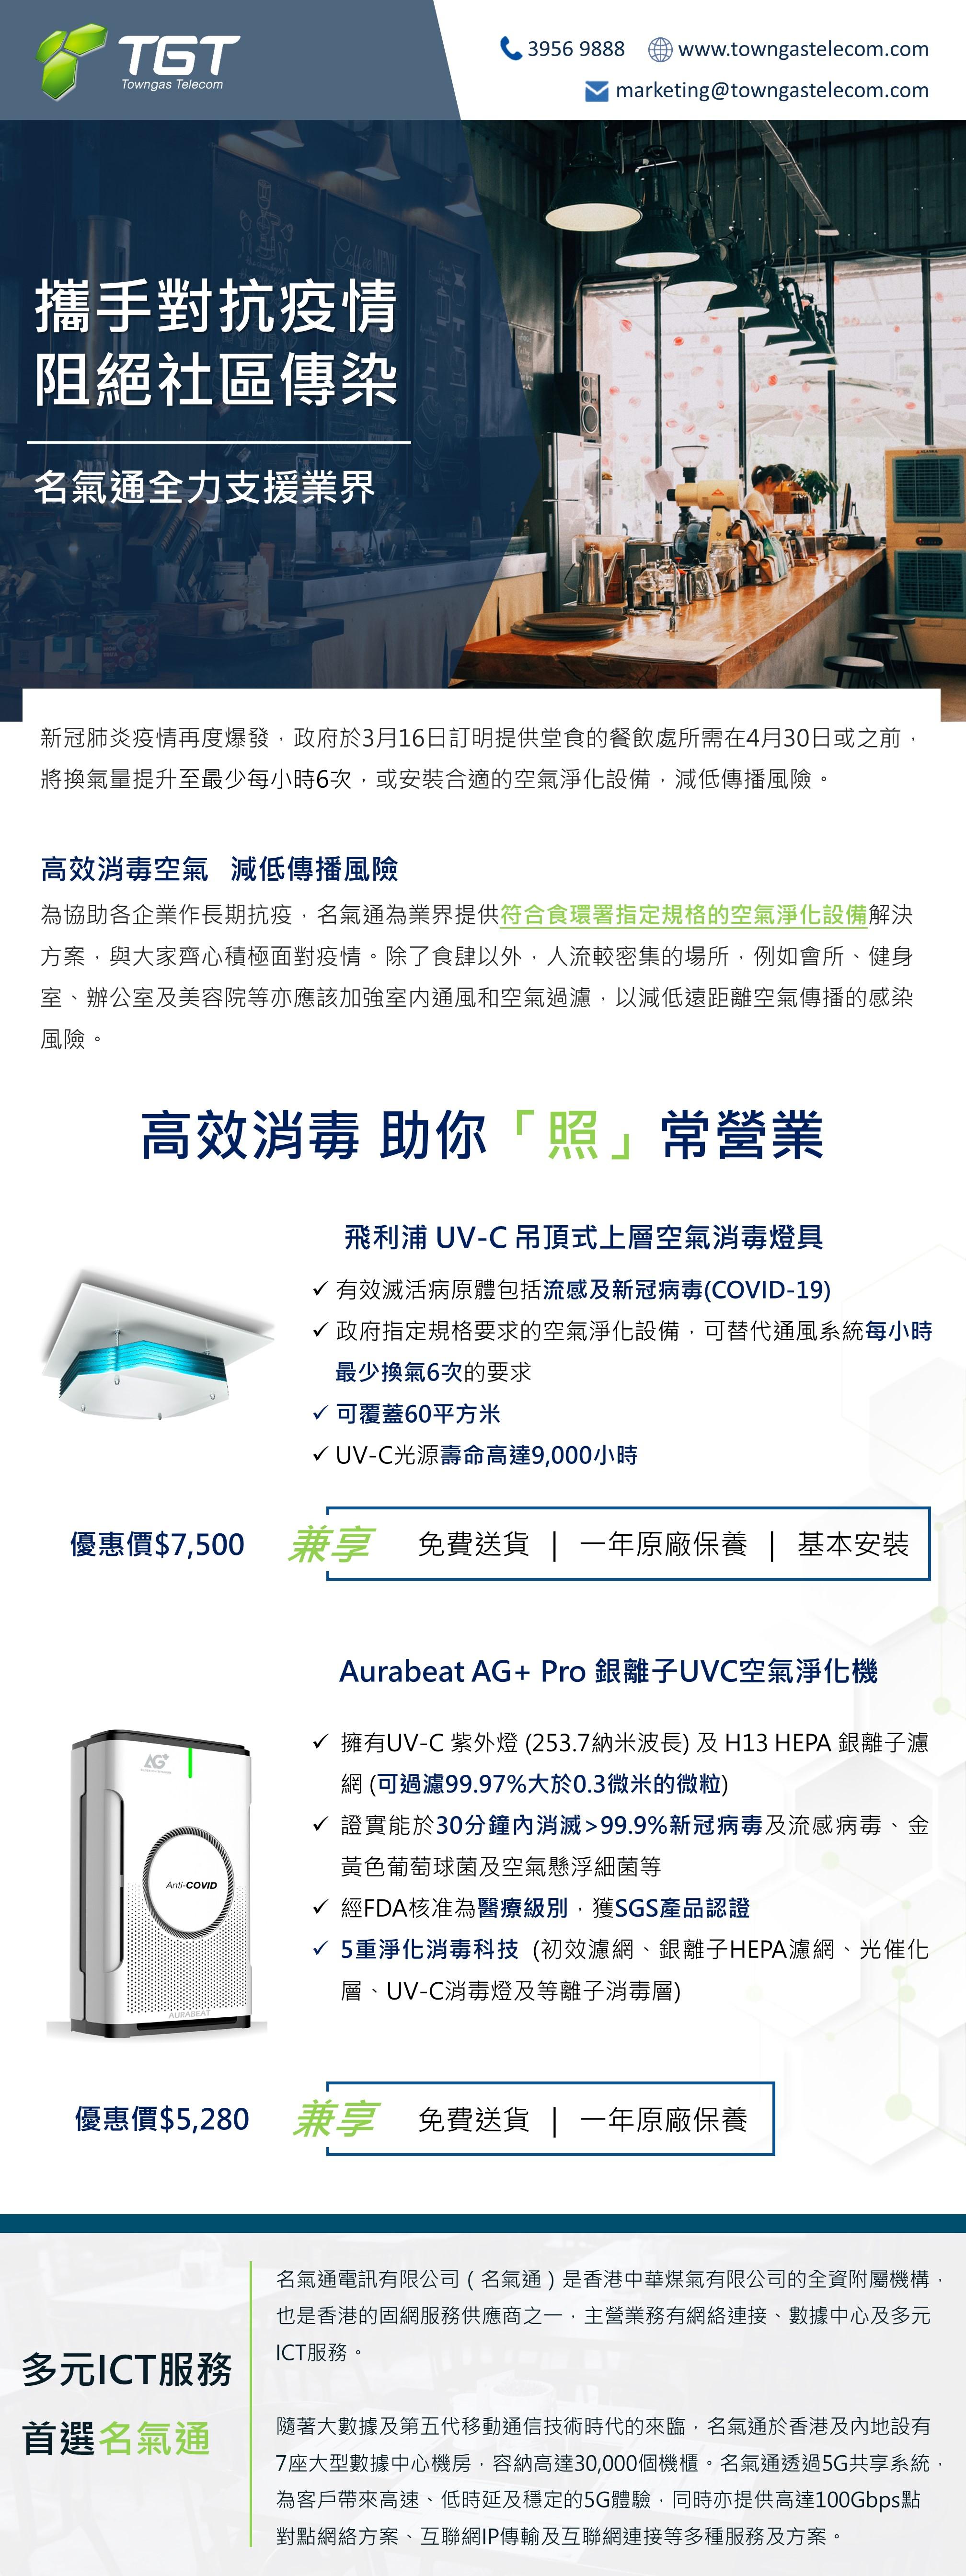 TGT_UV-C Product Leaflet